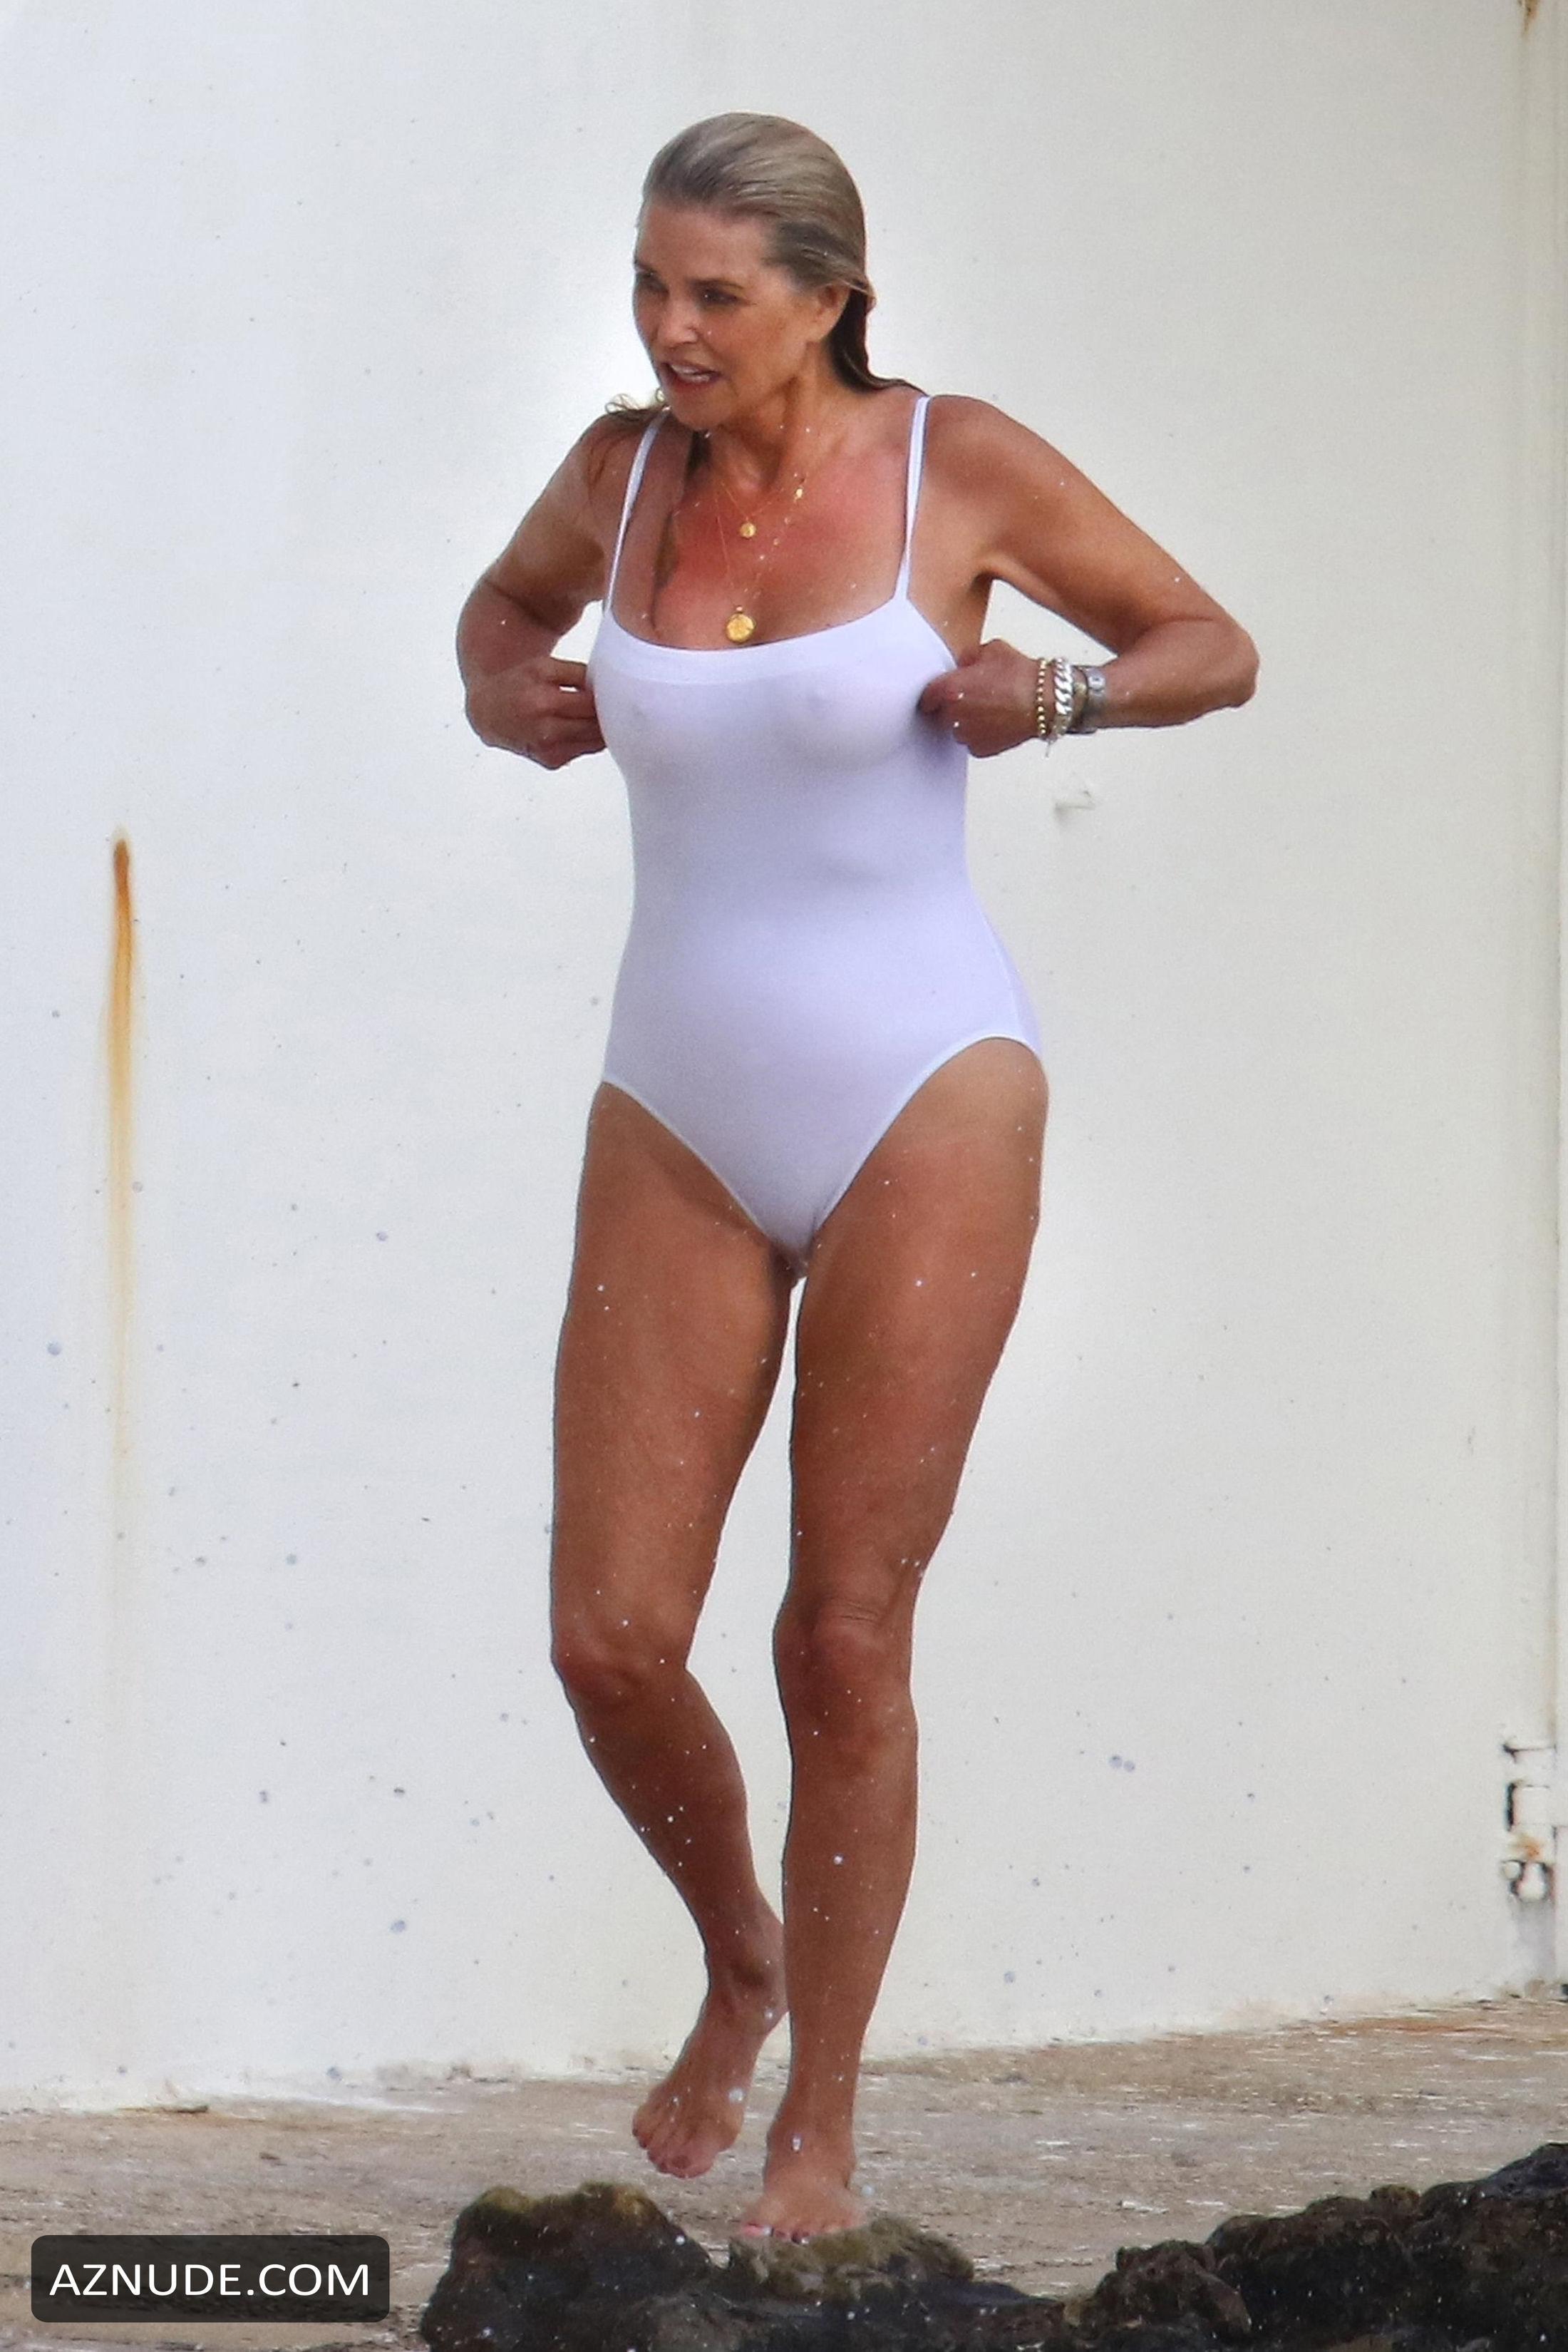 Christie Brinkley Hot Photos Enjoying The Beach With Her -3711